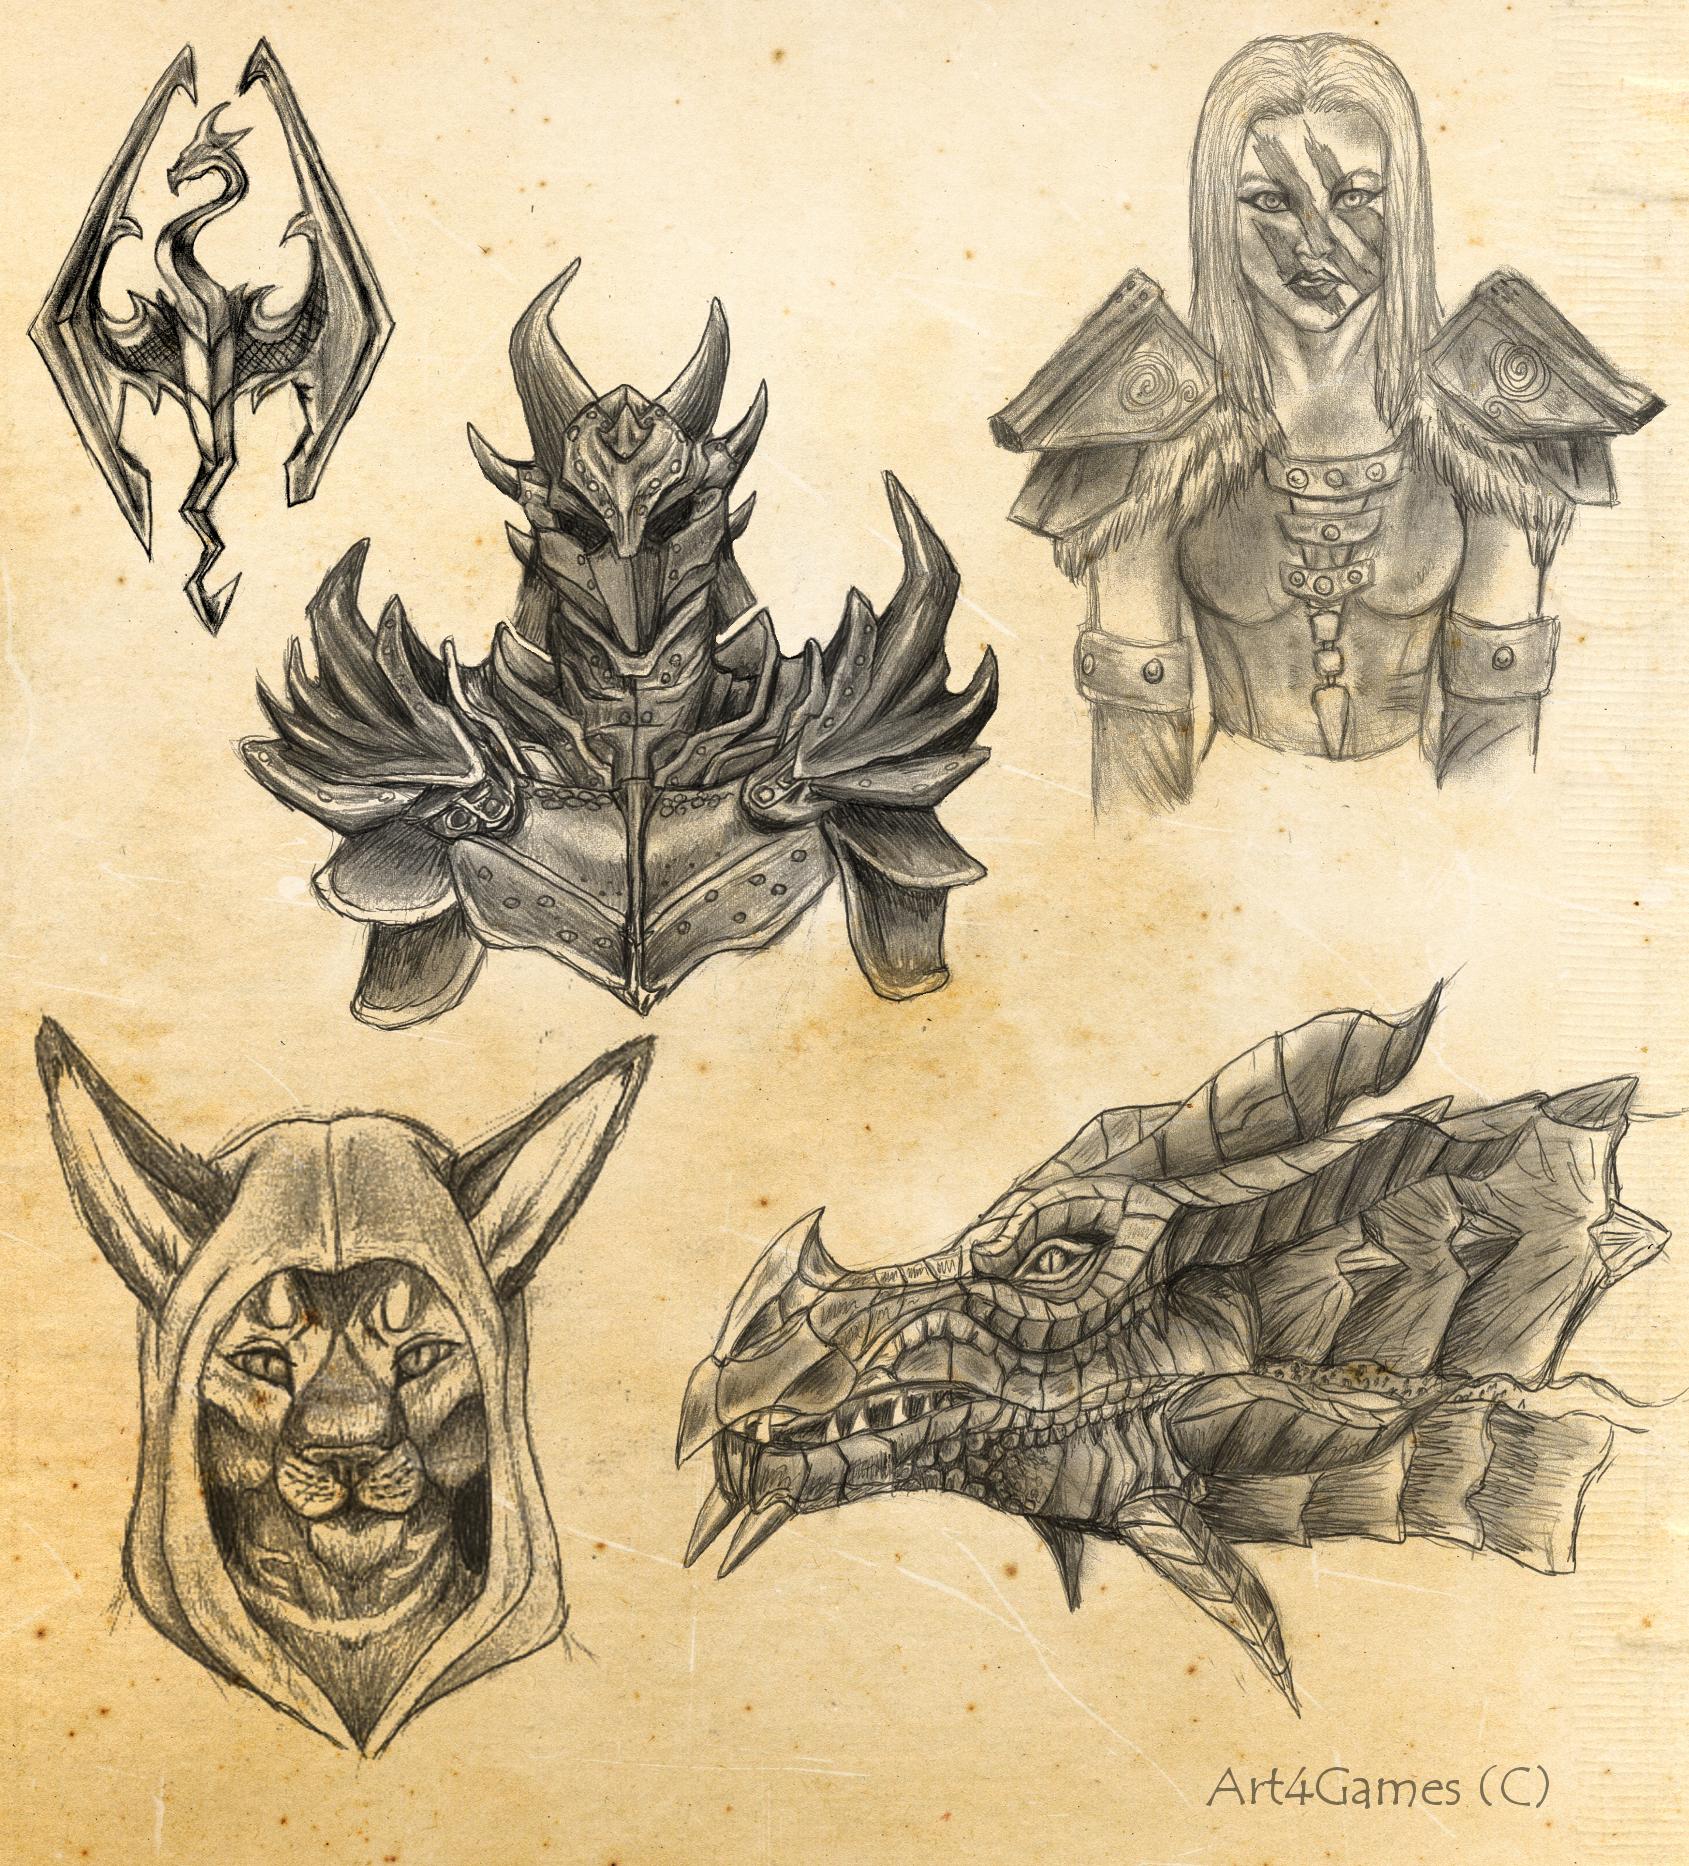 Skyrim sketches | •::Illustrations/Art (part |||)::• | Pinterest ...